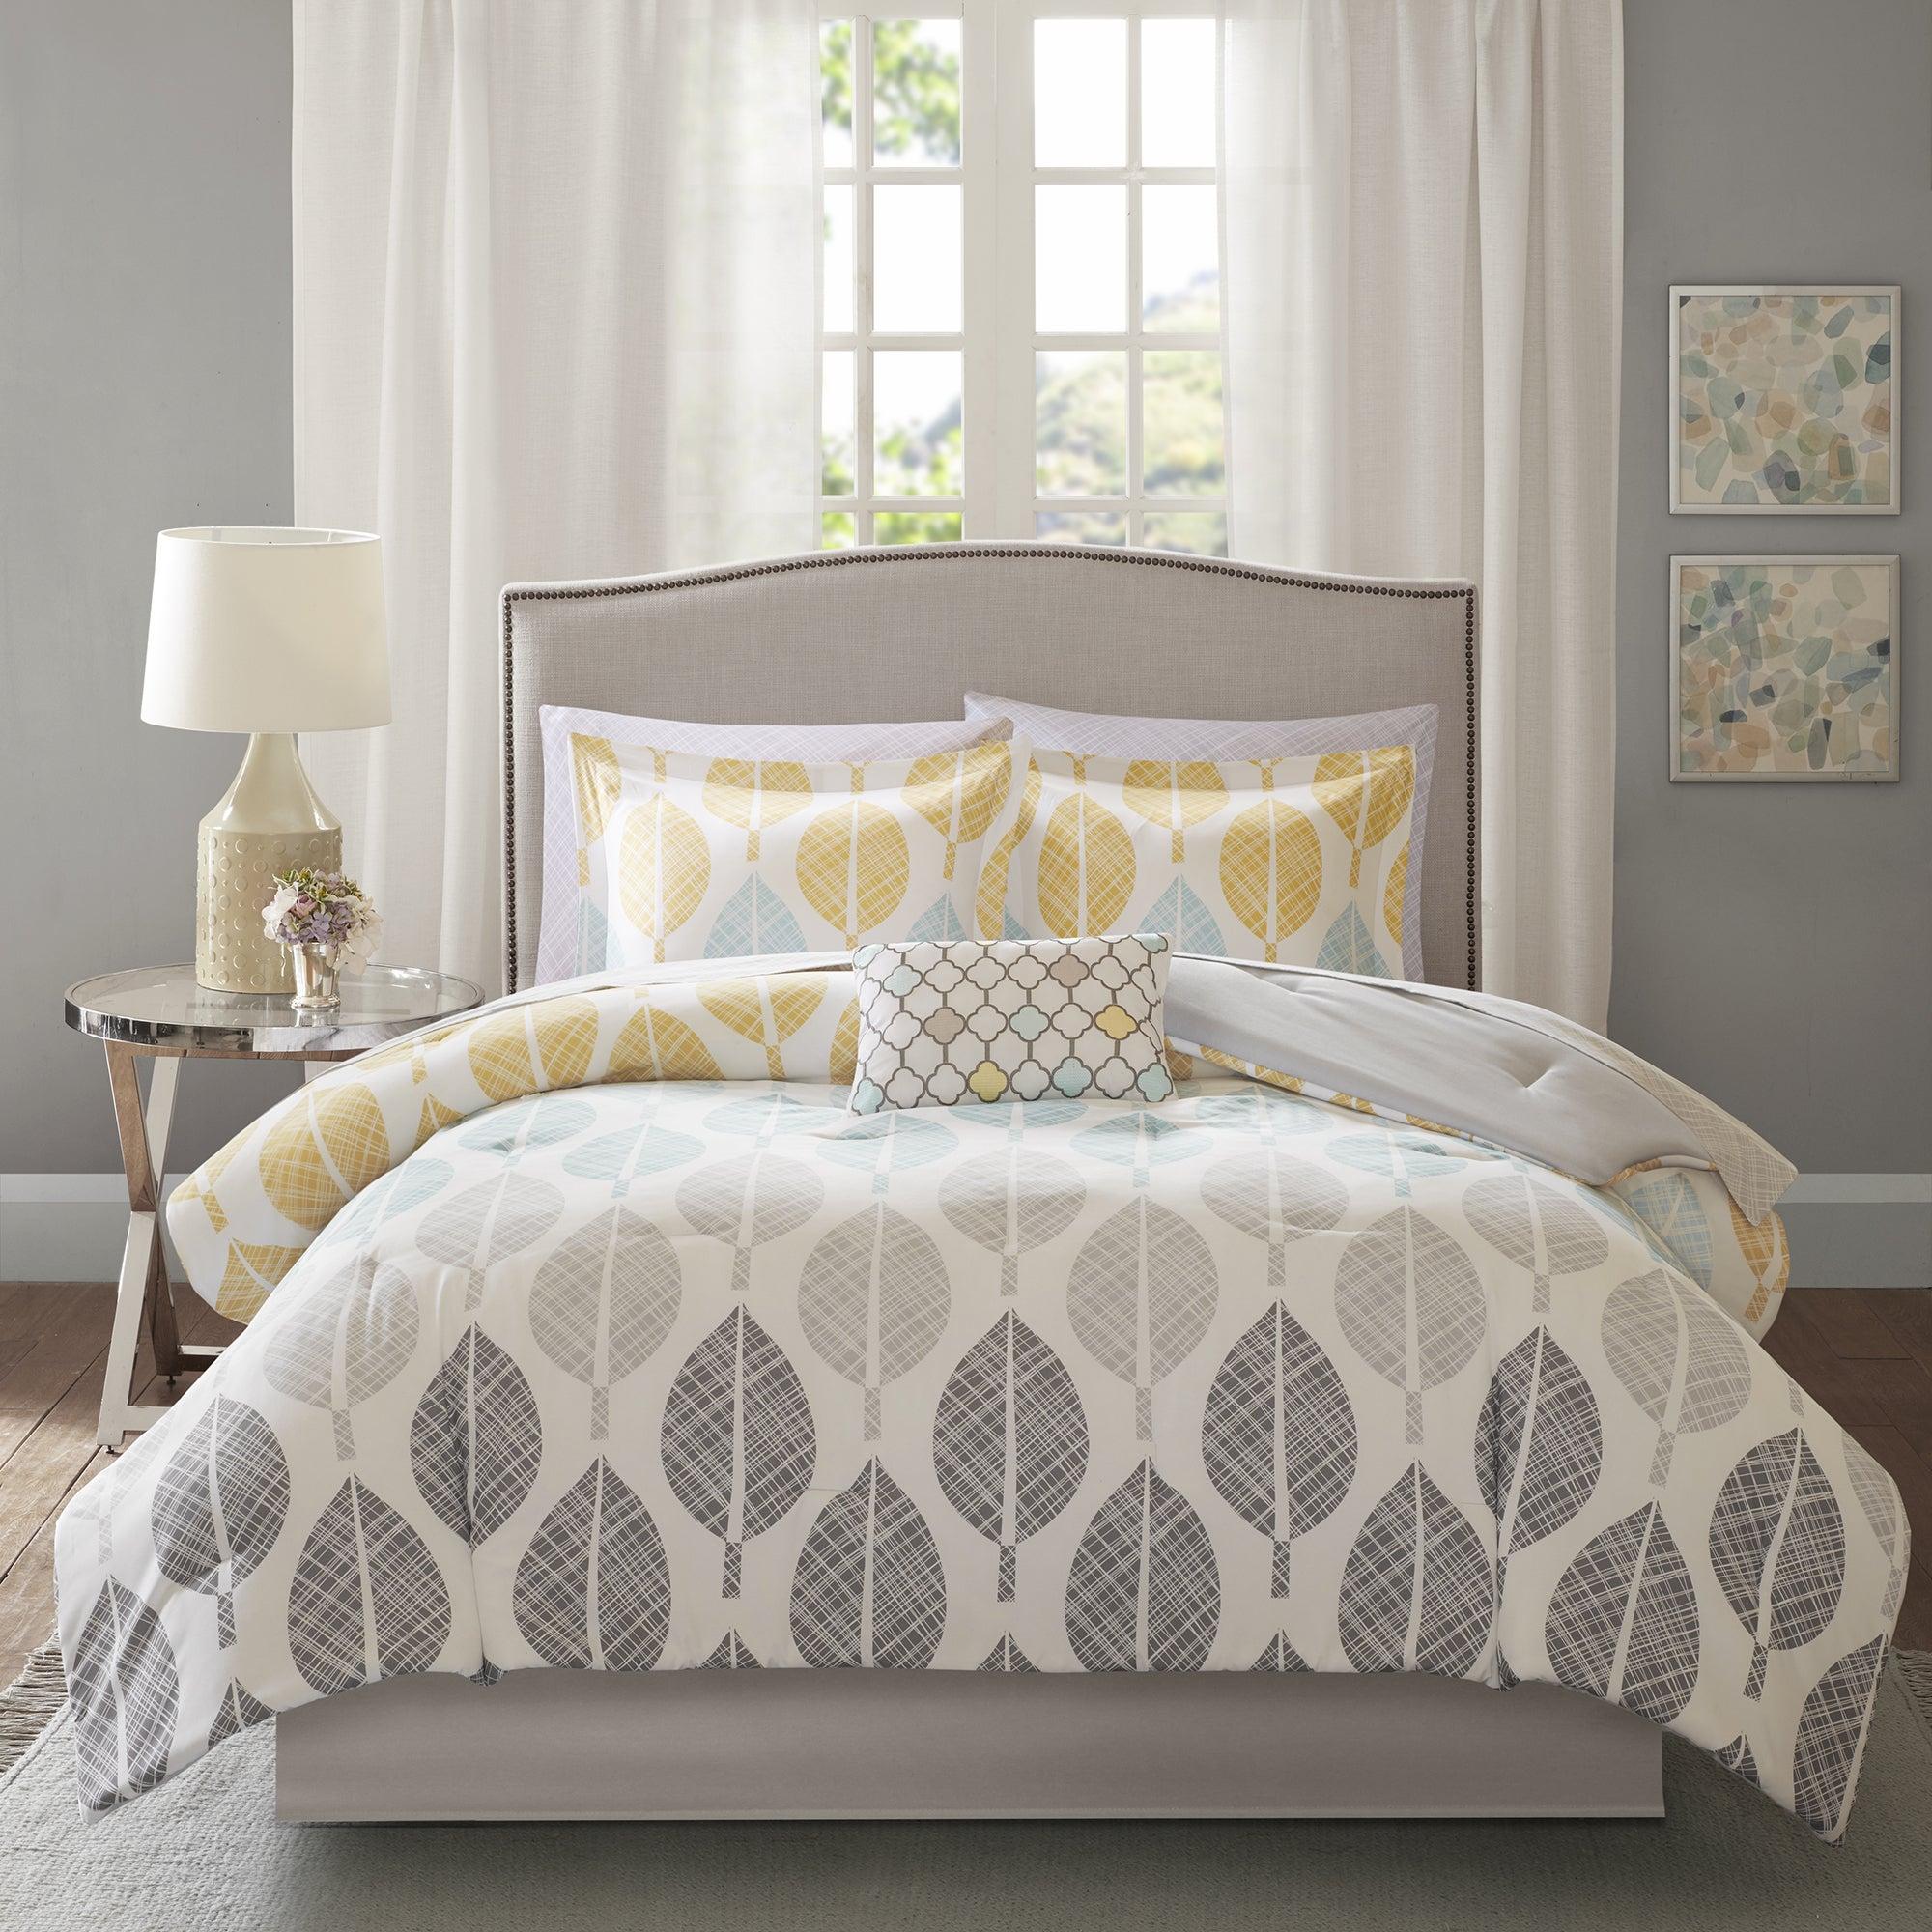 madison bath and product sheet com set overstock complete essentials park aqua bed comforter covina cotton bedding